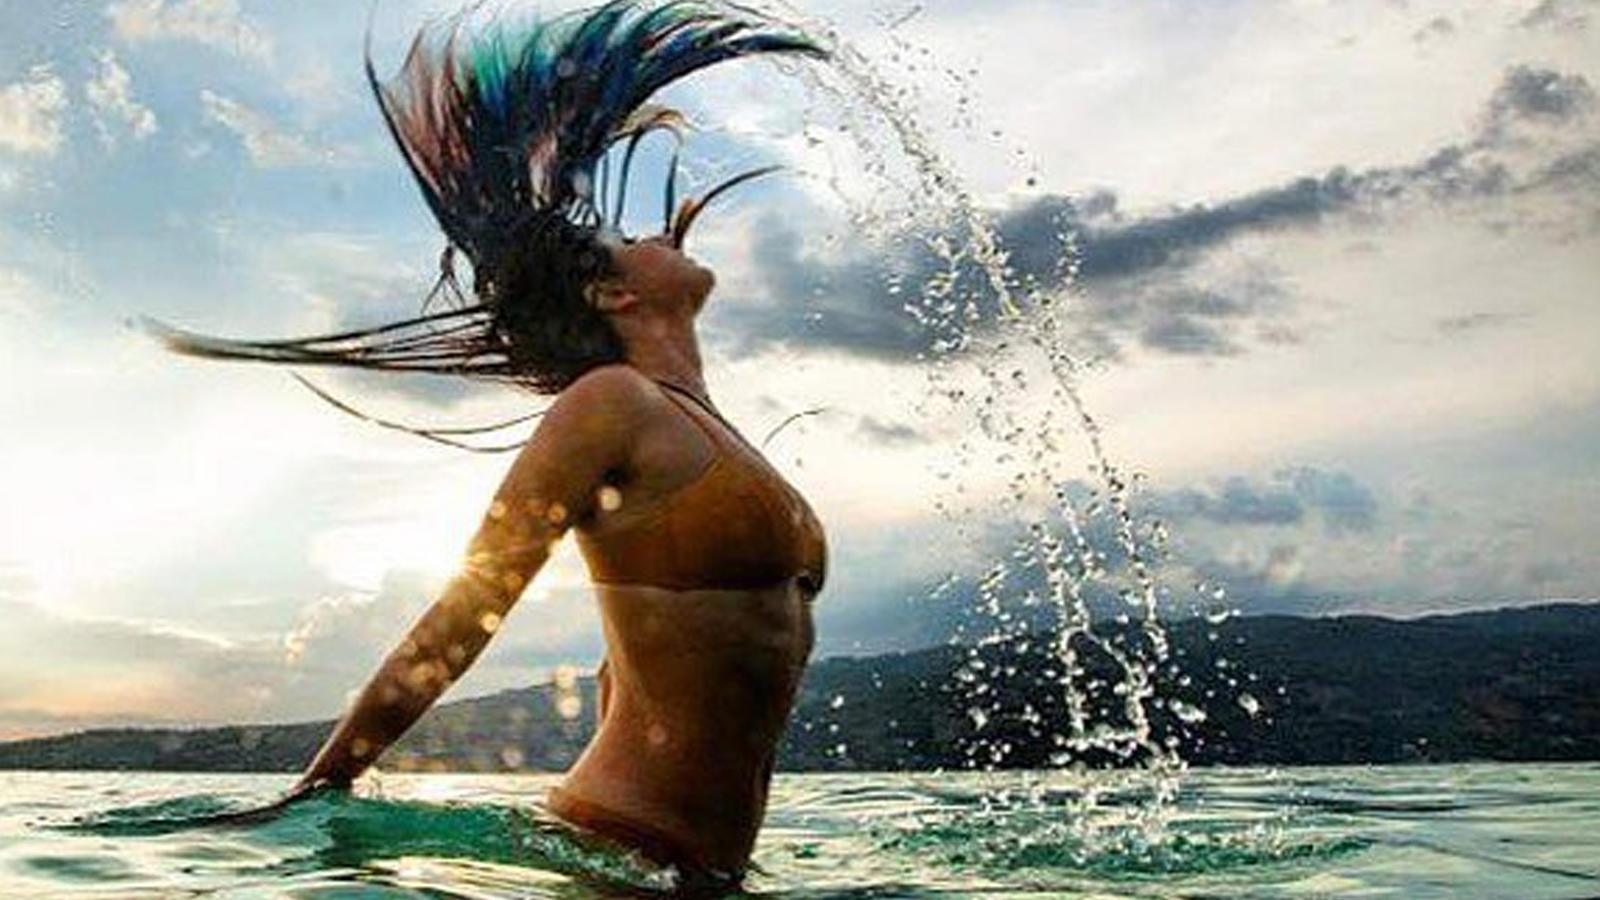 Katrina Kaif in bikini, creates storm on internet